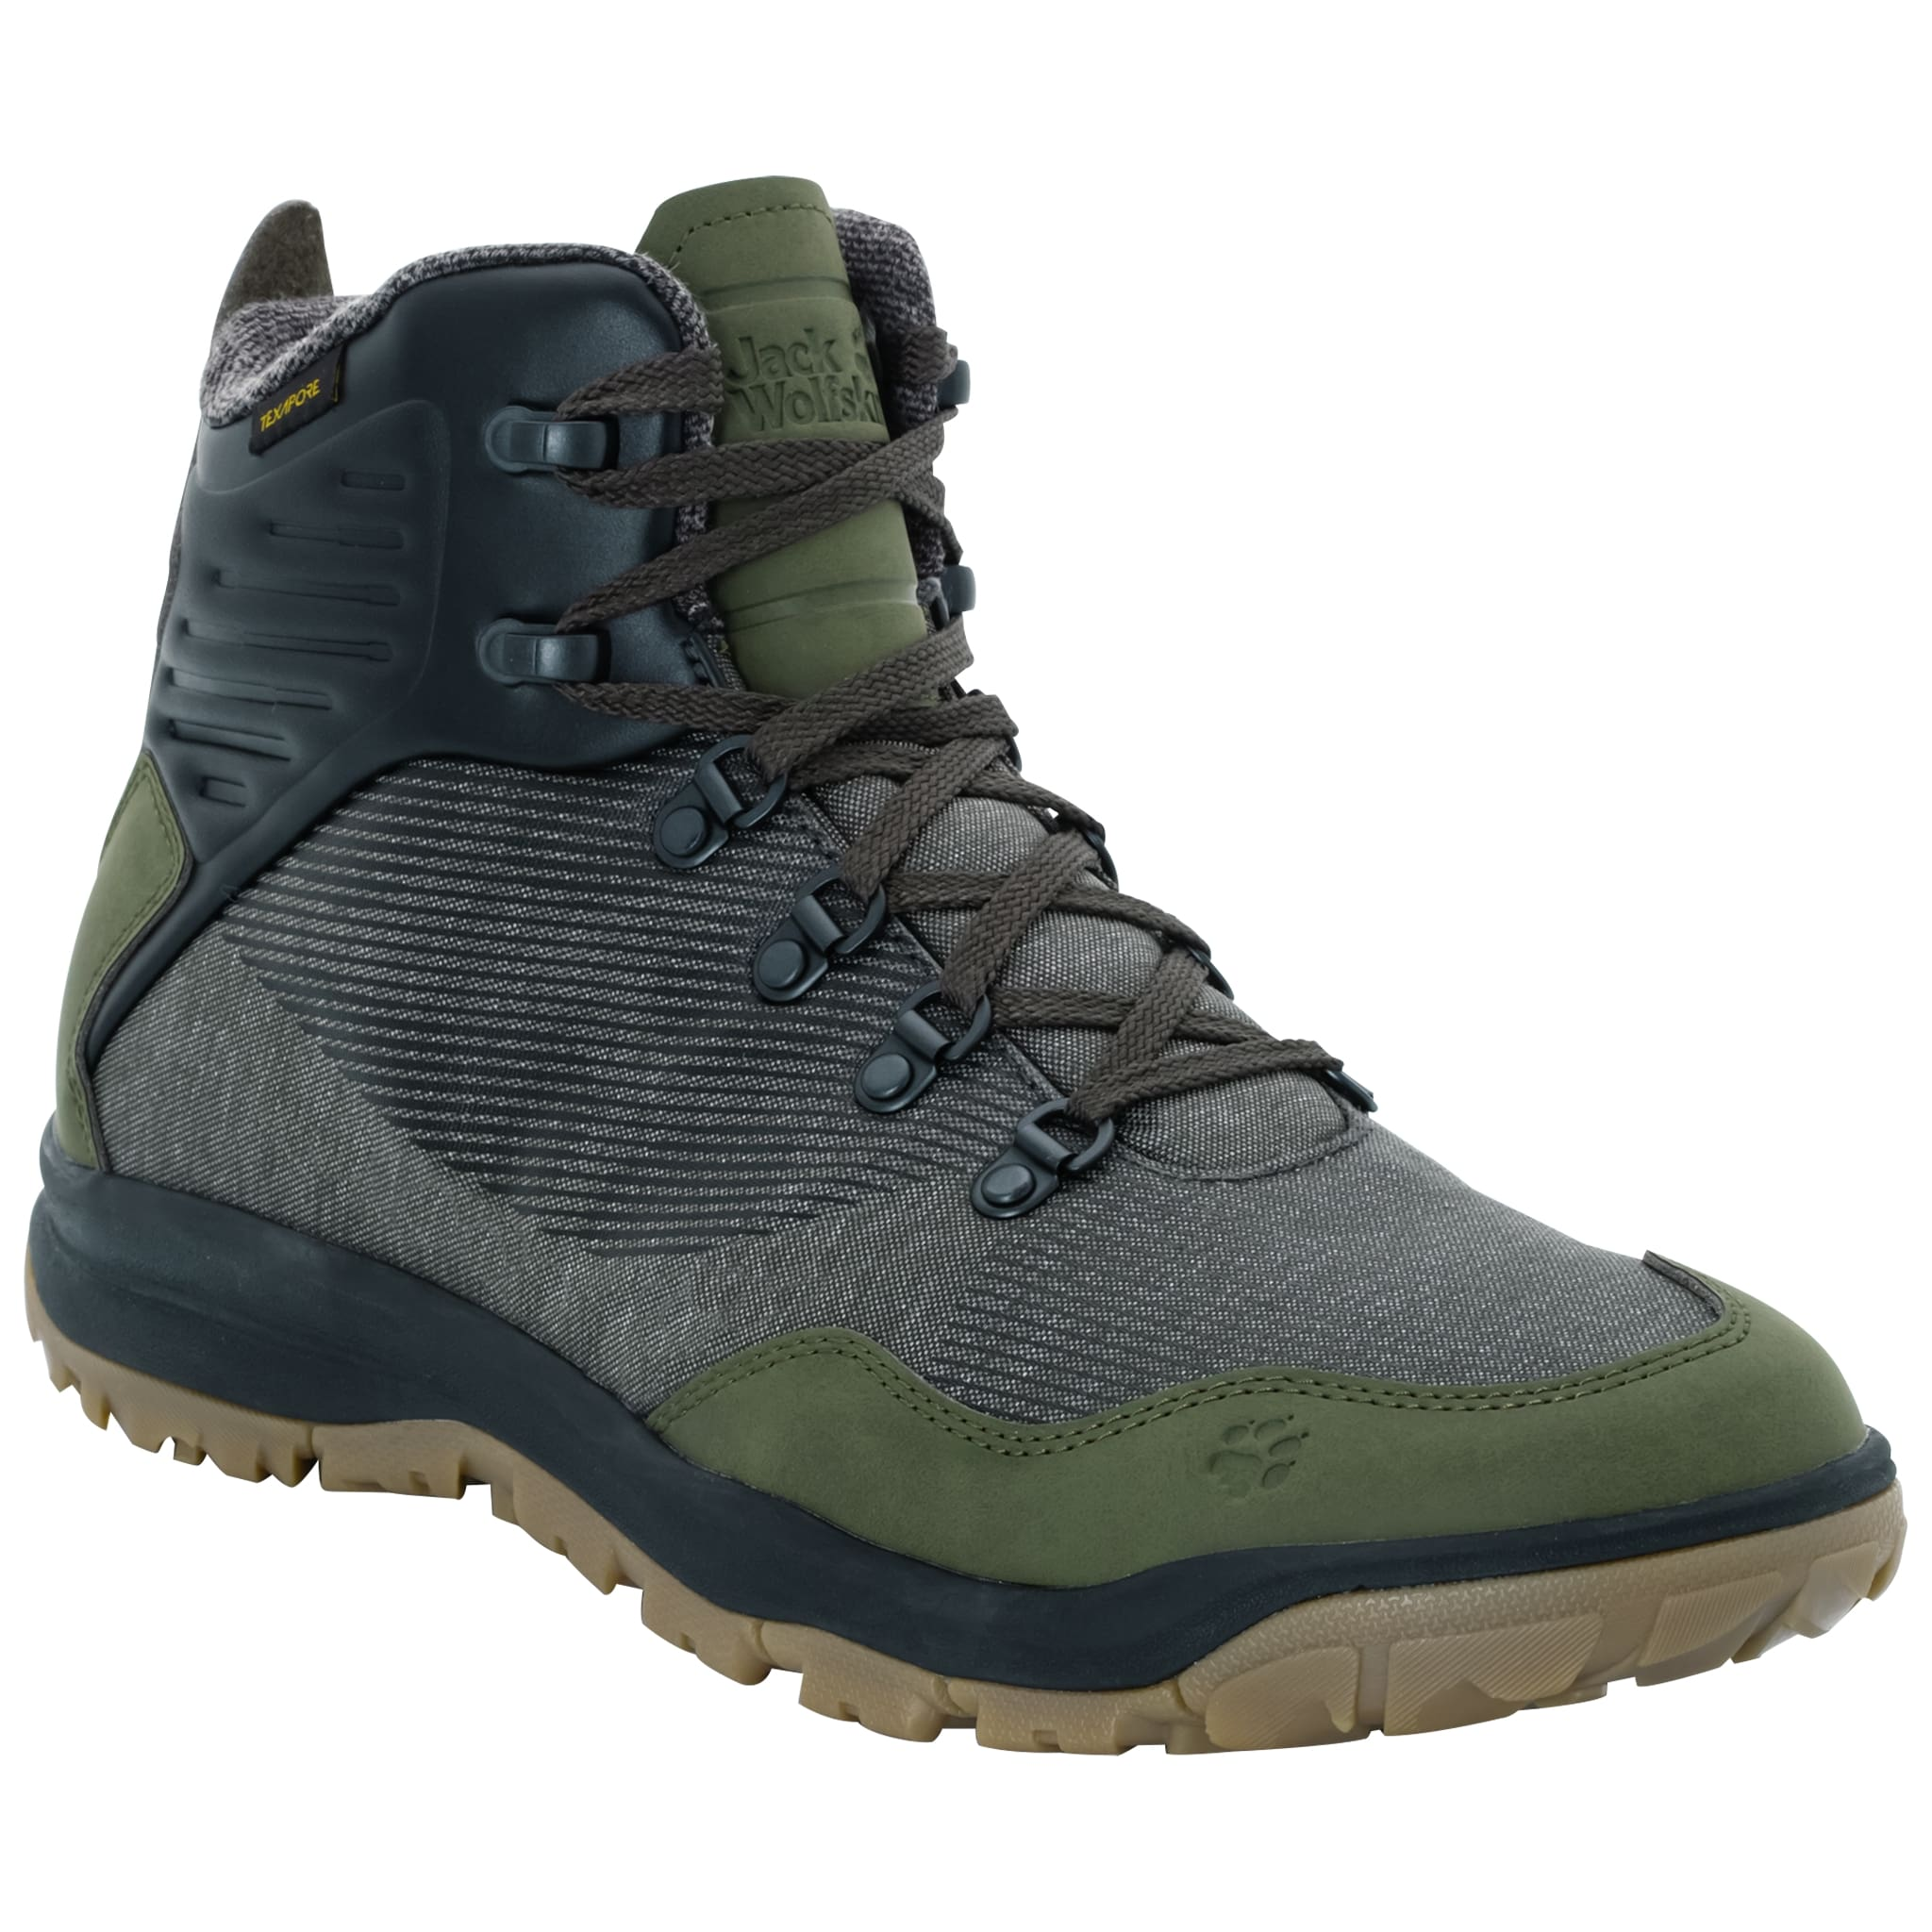 Jack Wolfskin Seven Wonders Texapore Mid Hiking Boots Men's